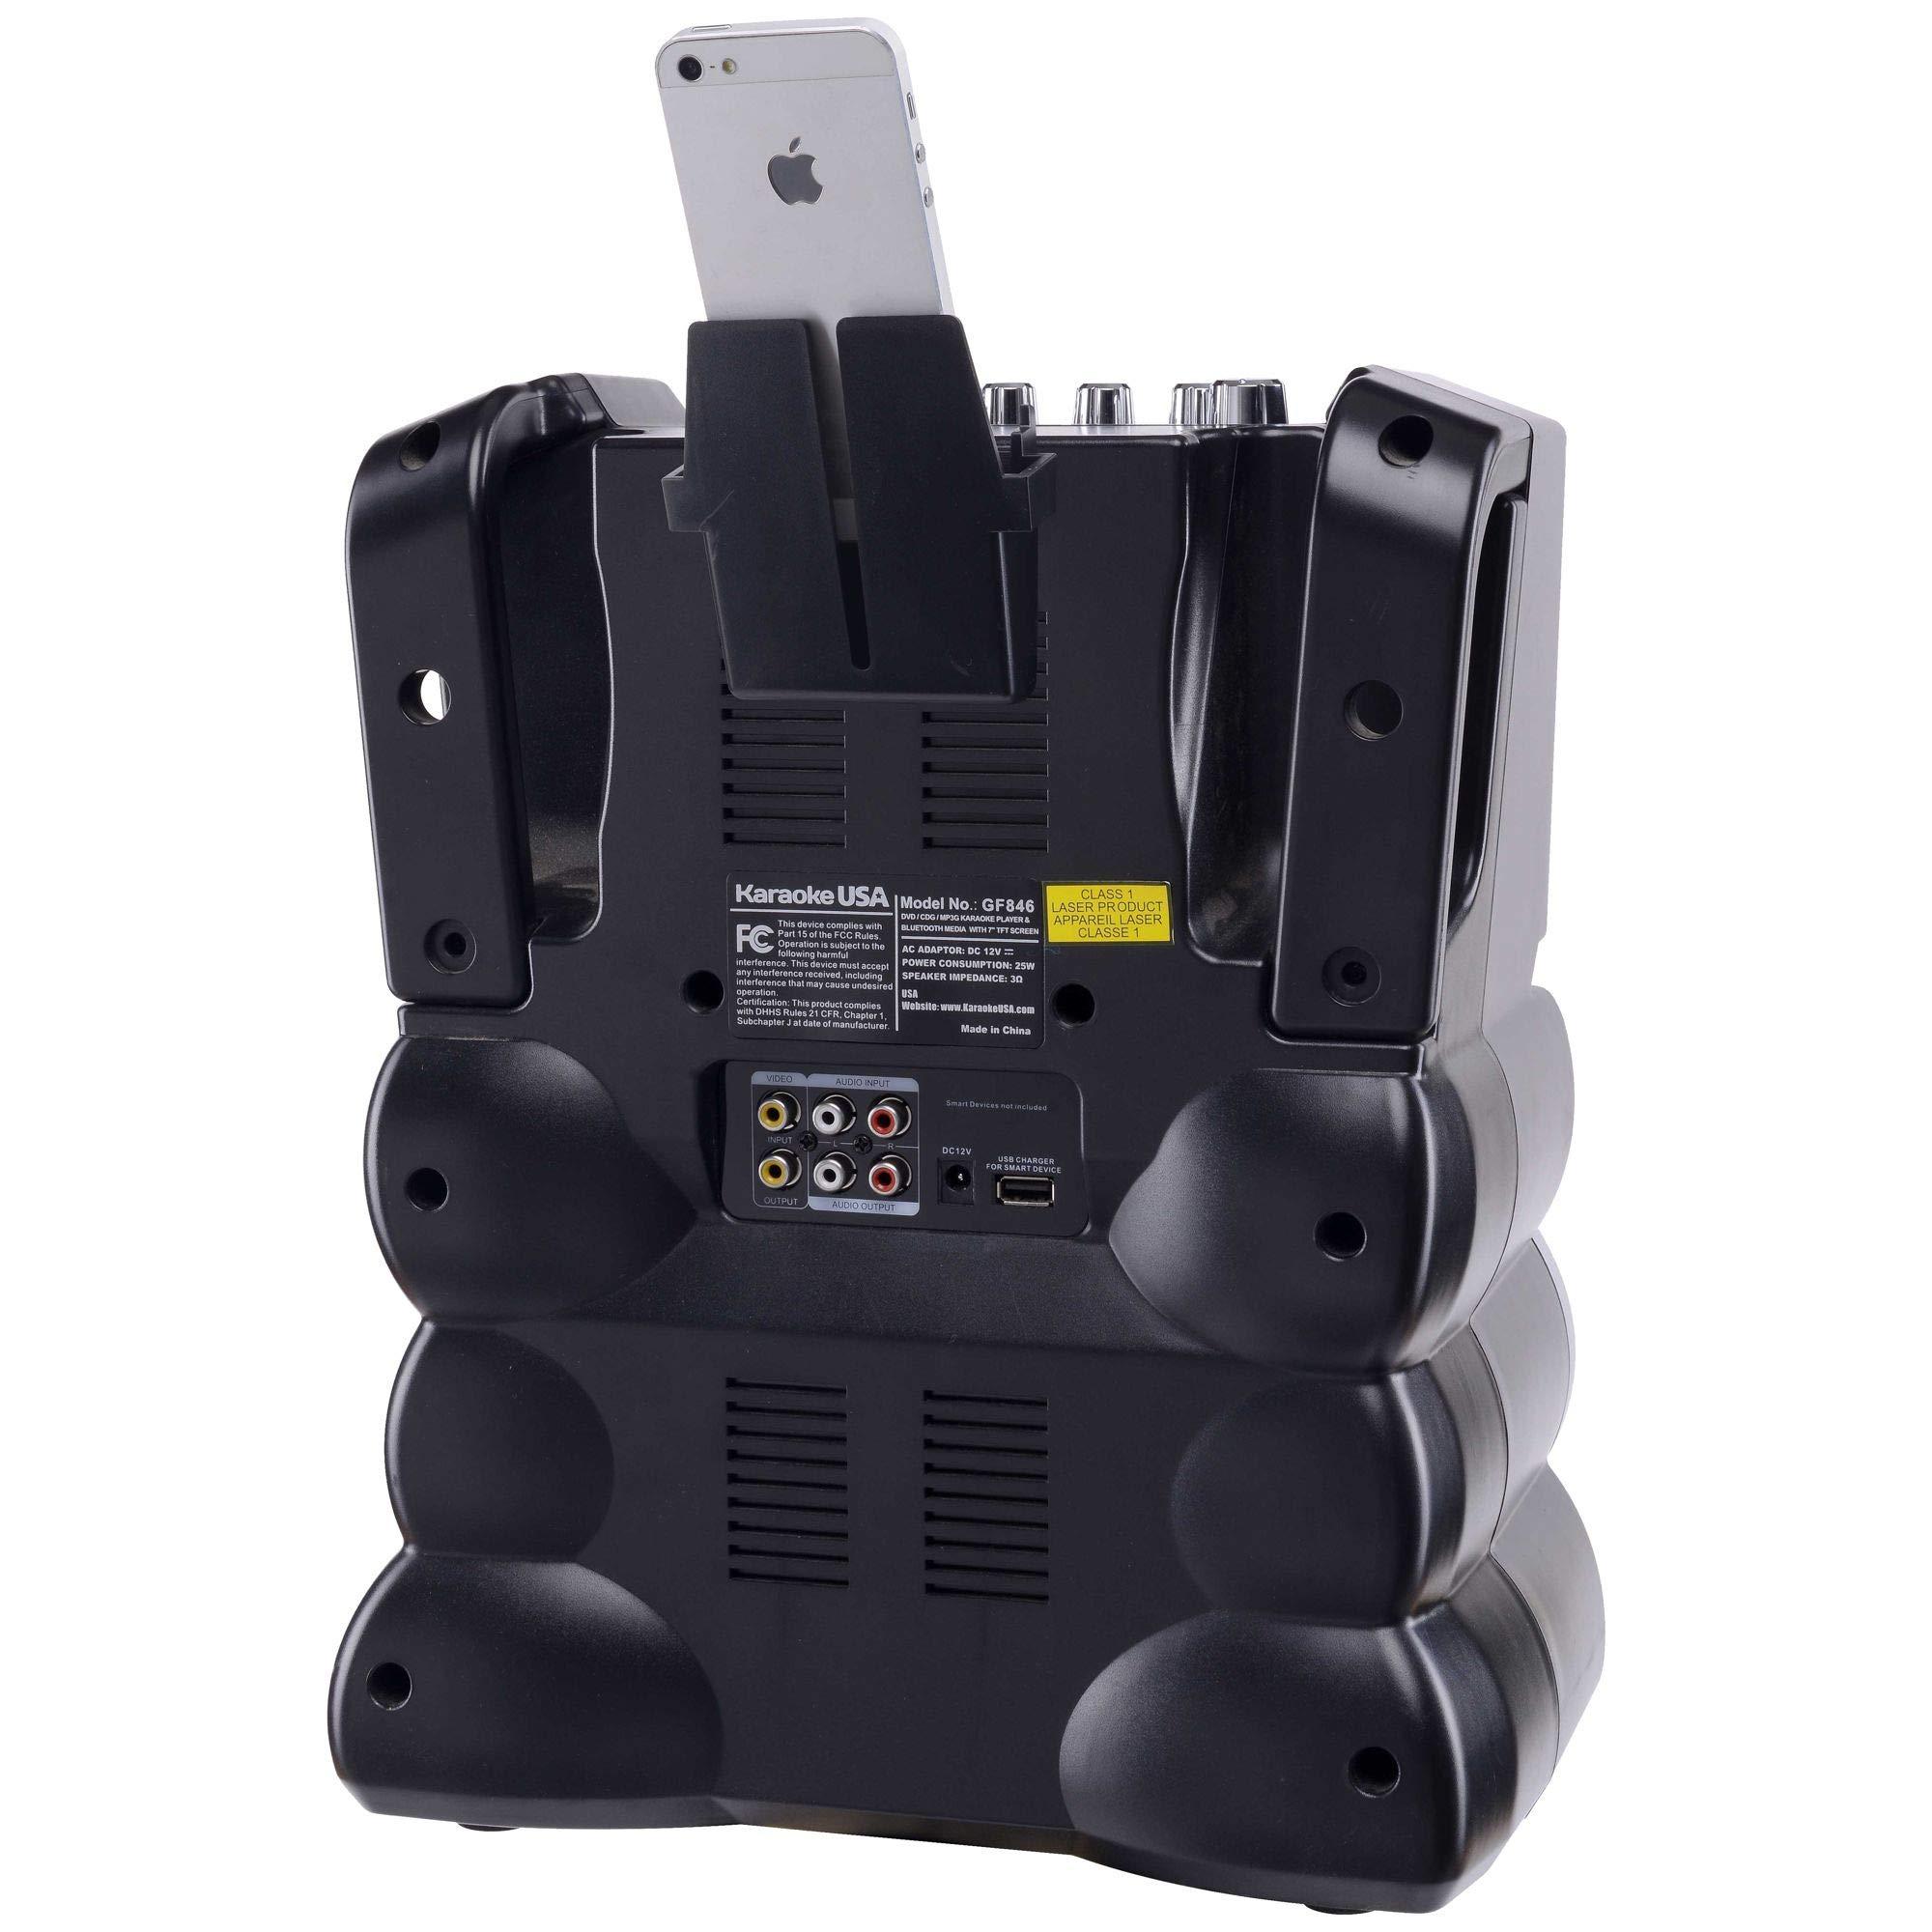 Karaoke USA GF846 DVD/CDG/MP3G Karaoke Machine with 7'' TFT Color Screen, Record, Bluetooth and LED Sync Lights by Karaoke USA (Image #7)